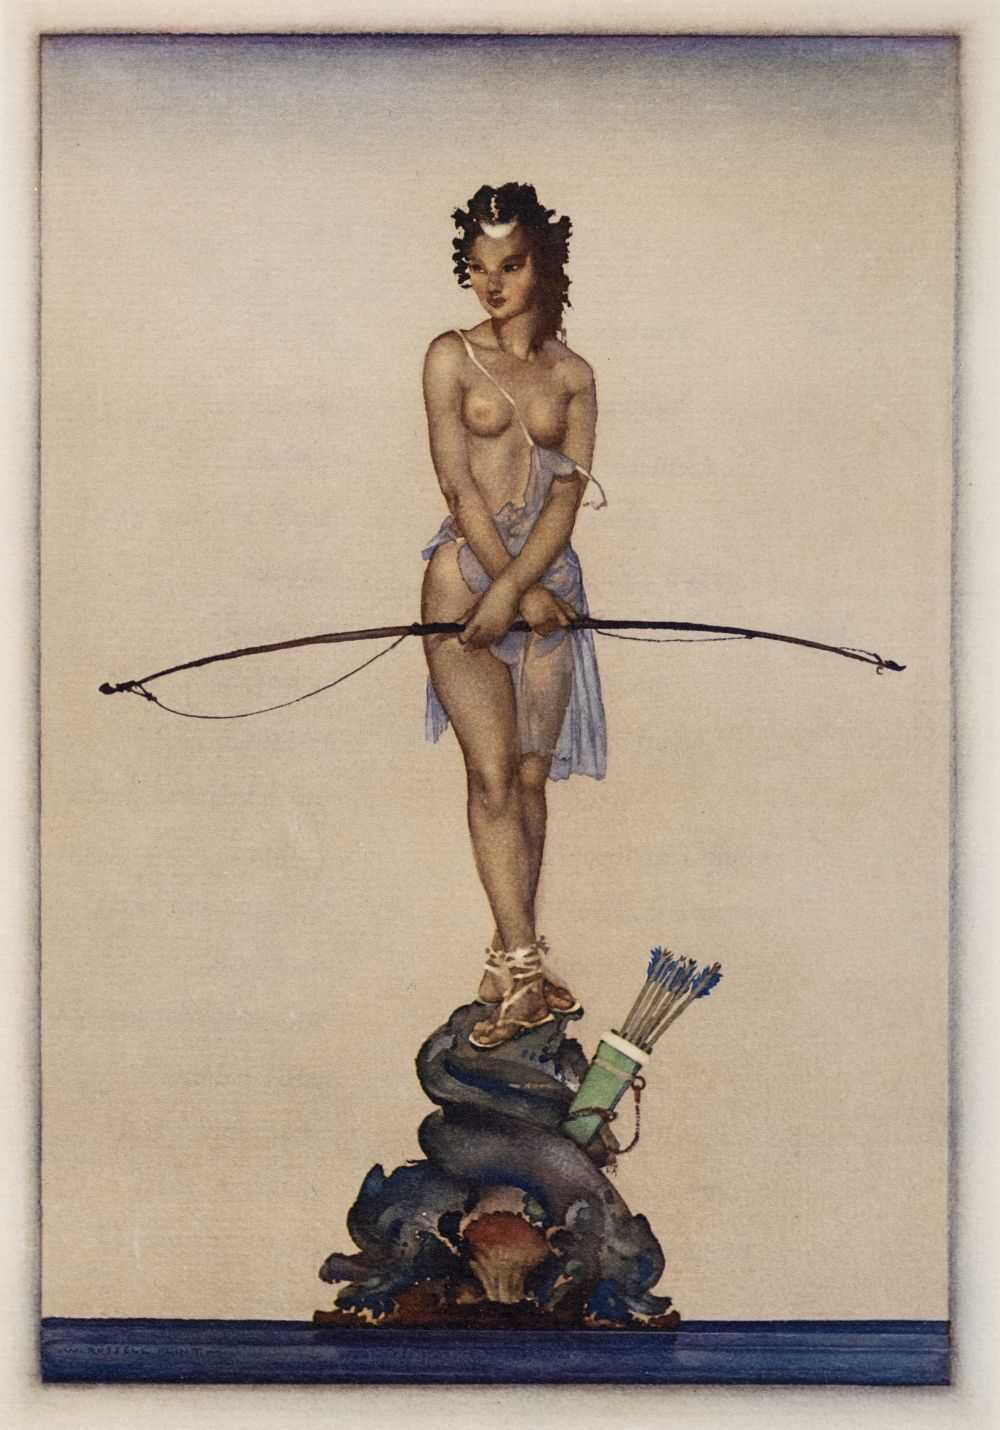 Lot 618 - Flint (Sir William Russell). The Lisping Goddess, 1968